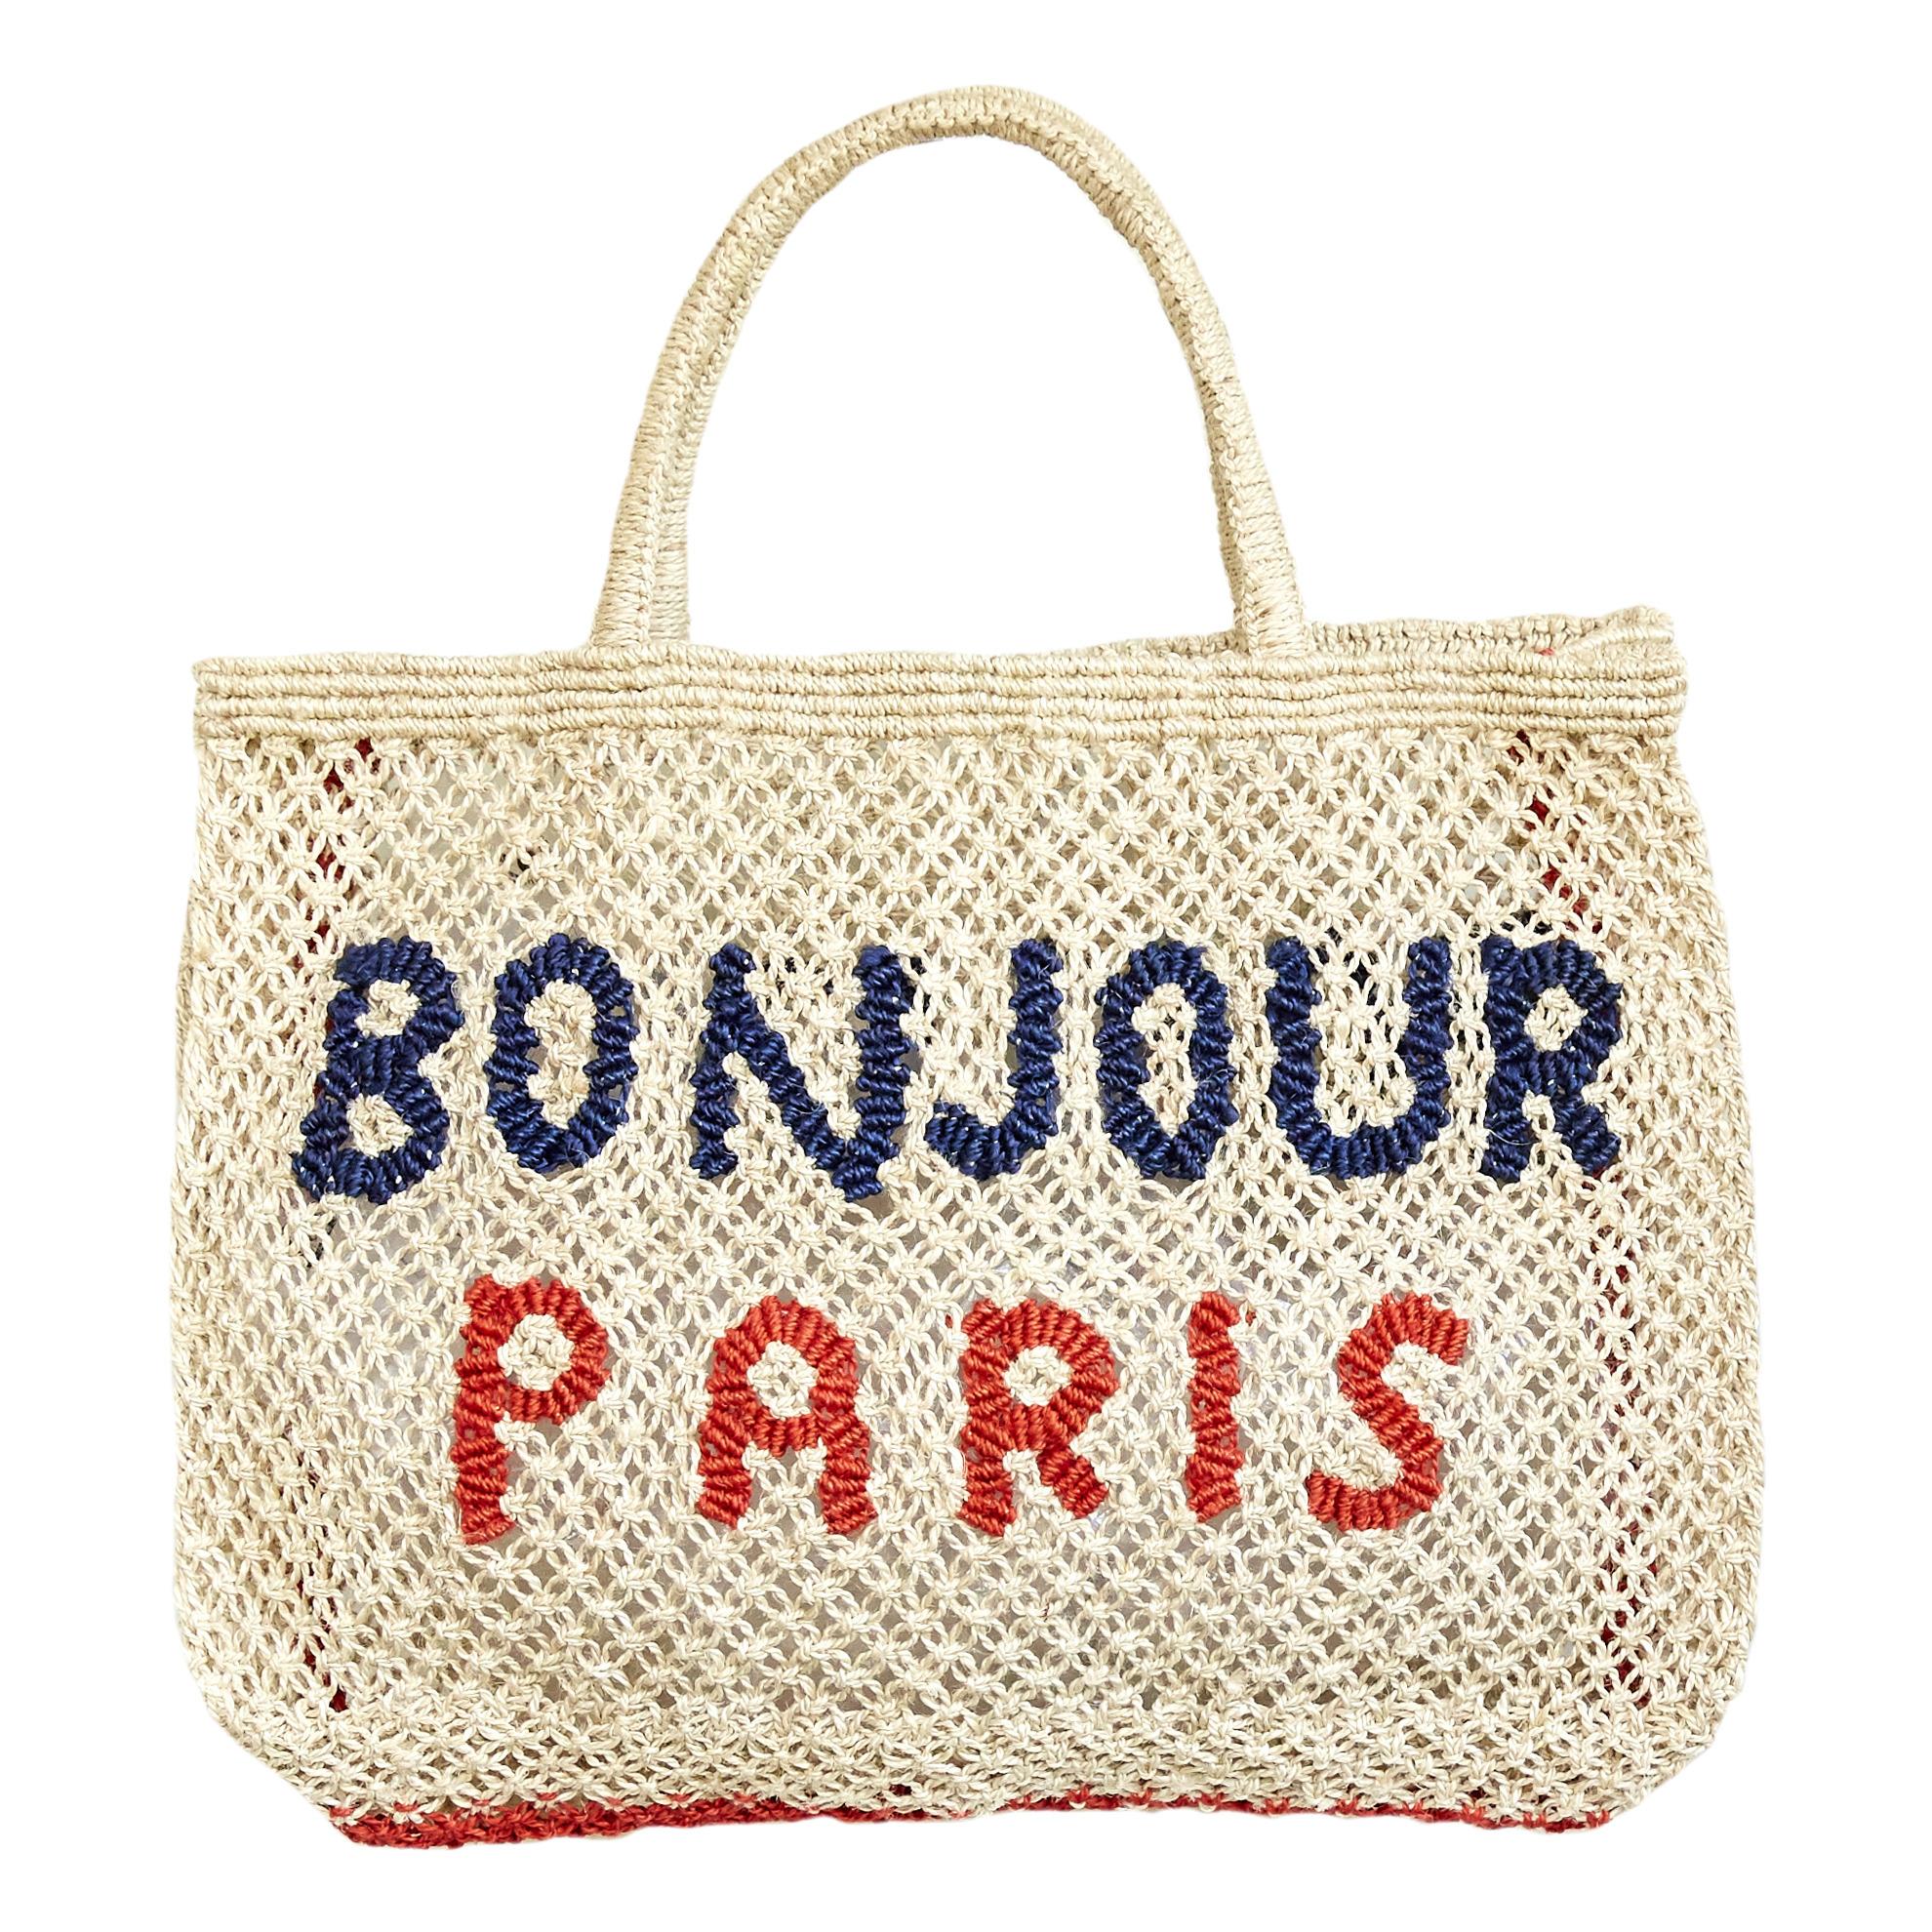 Image of Bonjour Paris Basket Bag